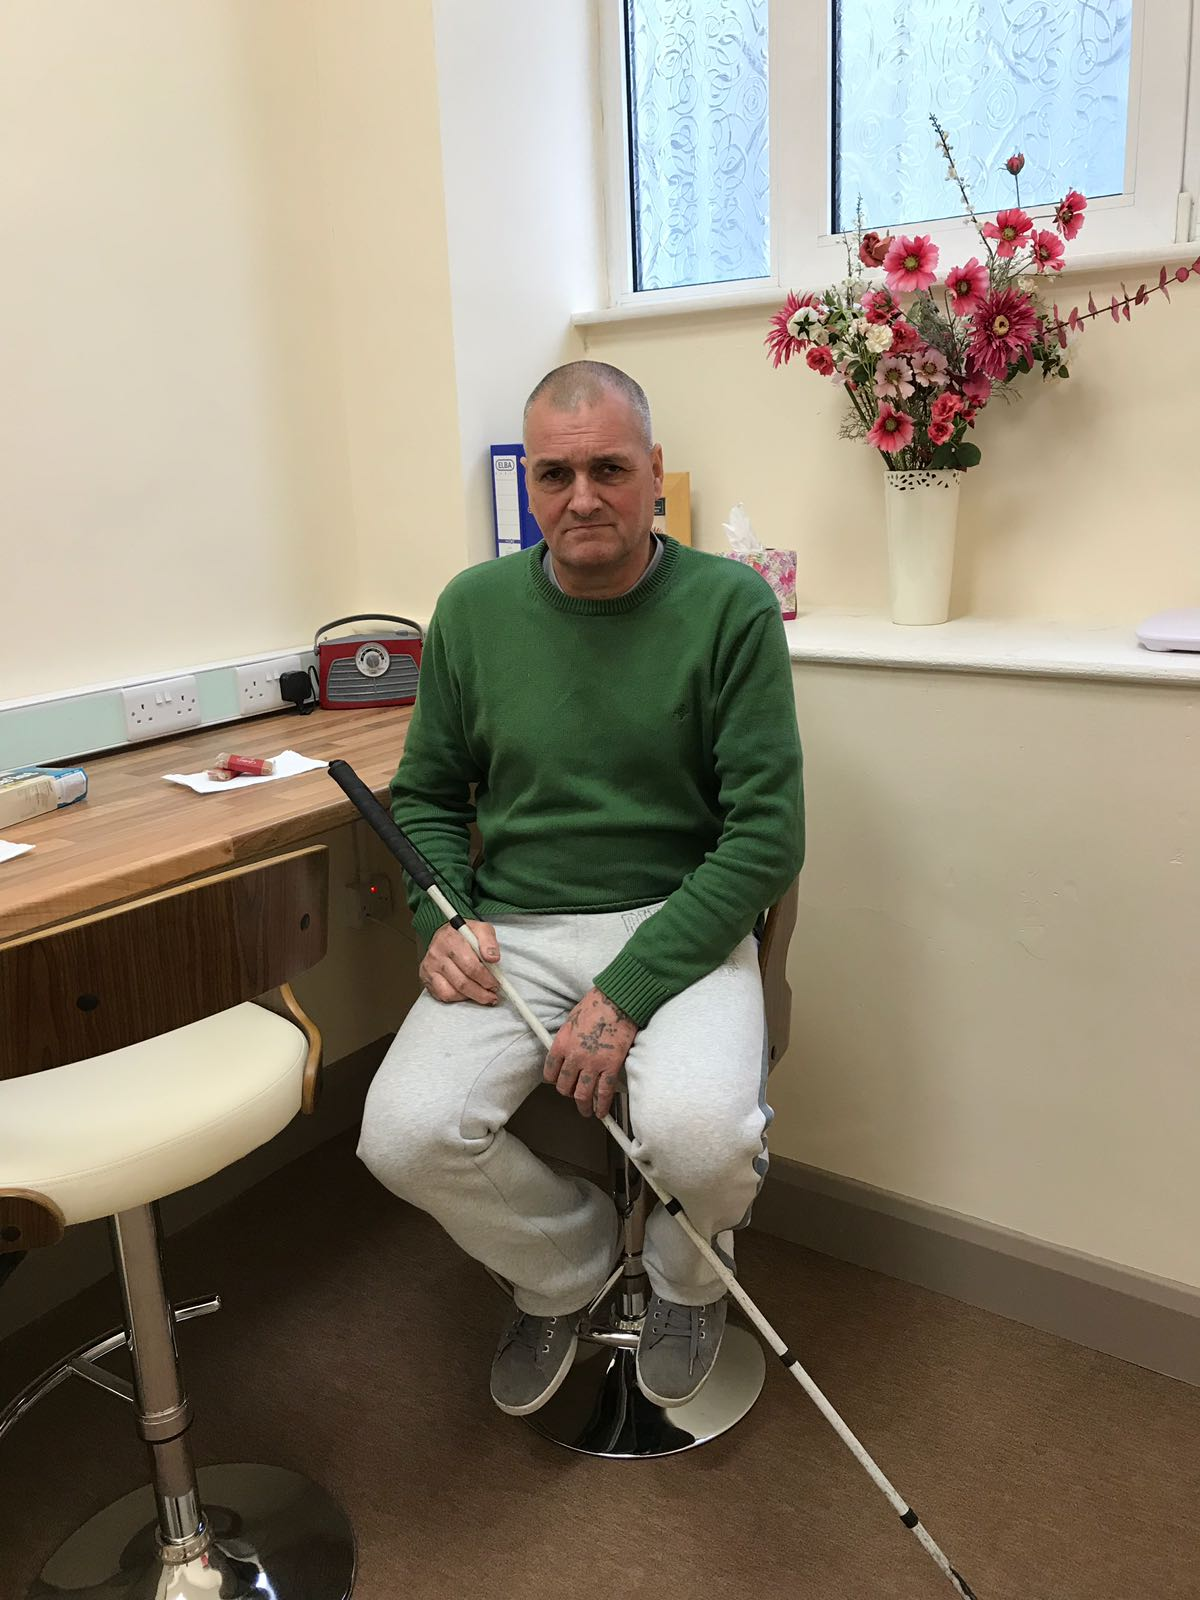 Robert Orr sitting in the NCBI Office in Galway